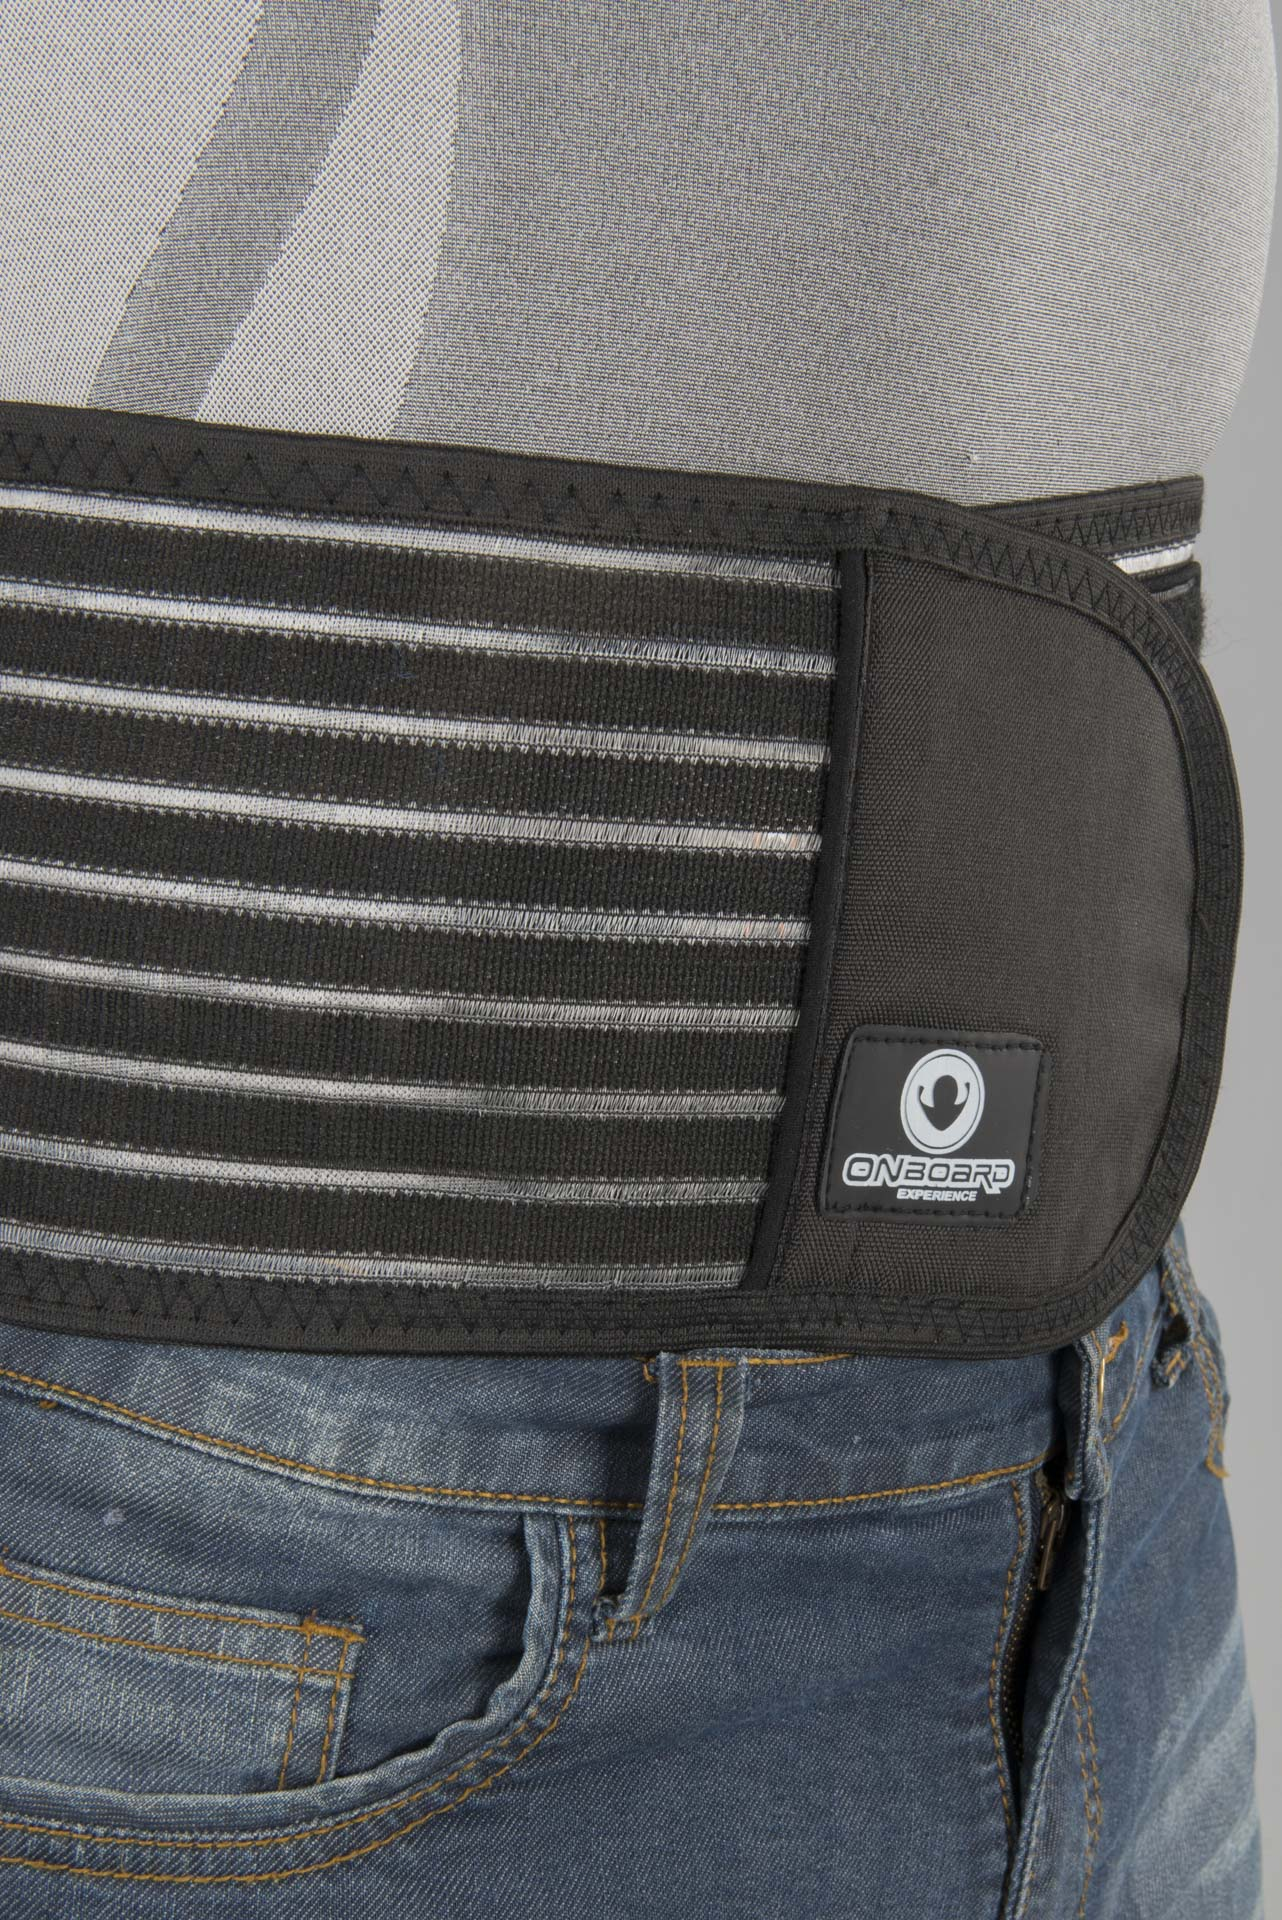 IXS Hilo Kidney Belt Black, Large